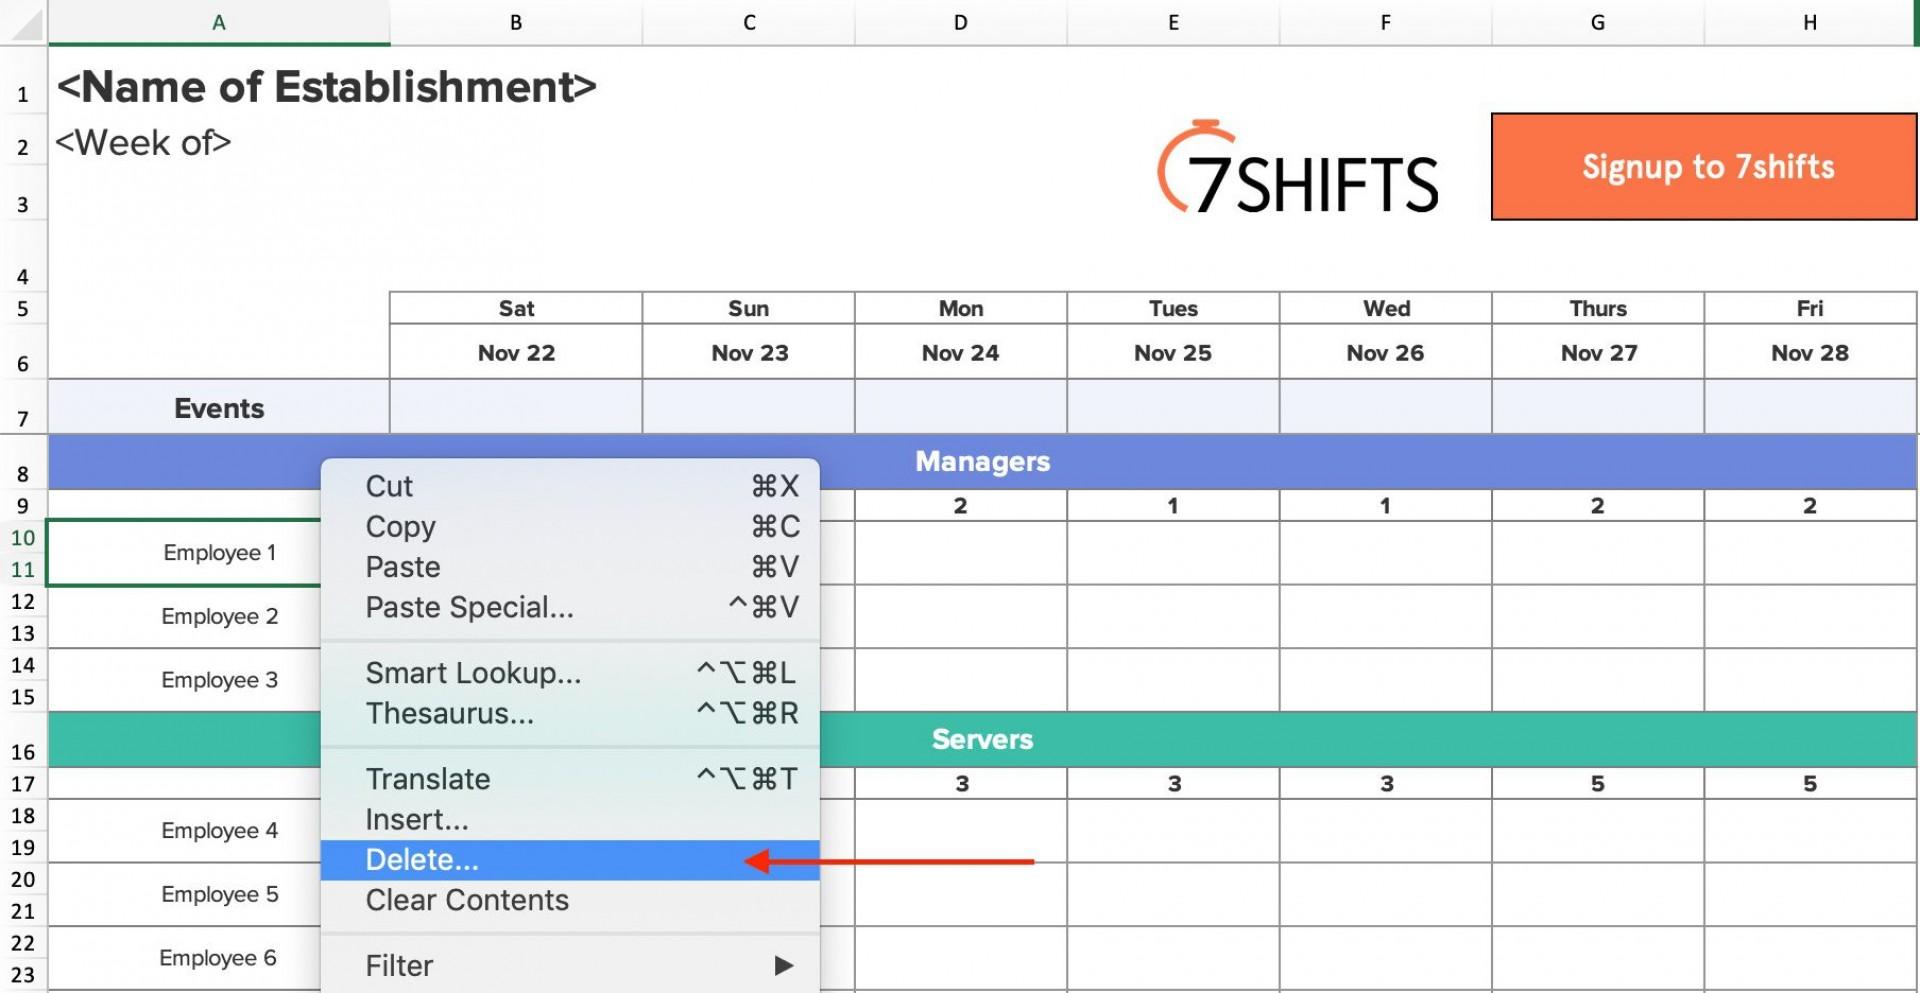 000 Outstanding Employee Shift Scheduling Template Example  Schedule Google Sheet Work Plan Word Weekly Excel Free1920